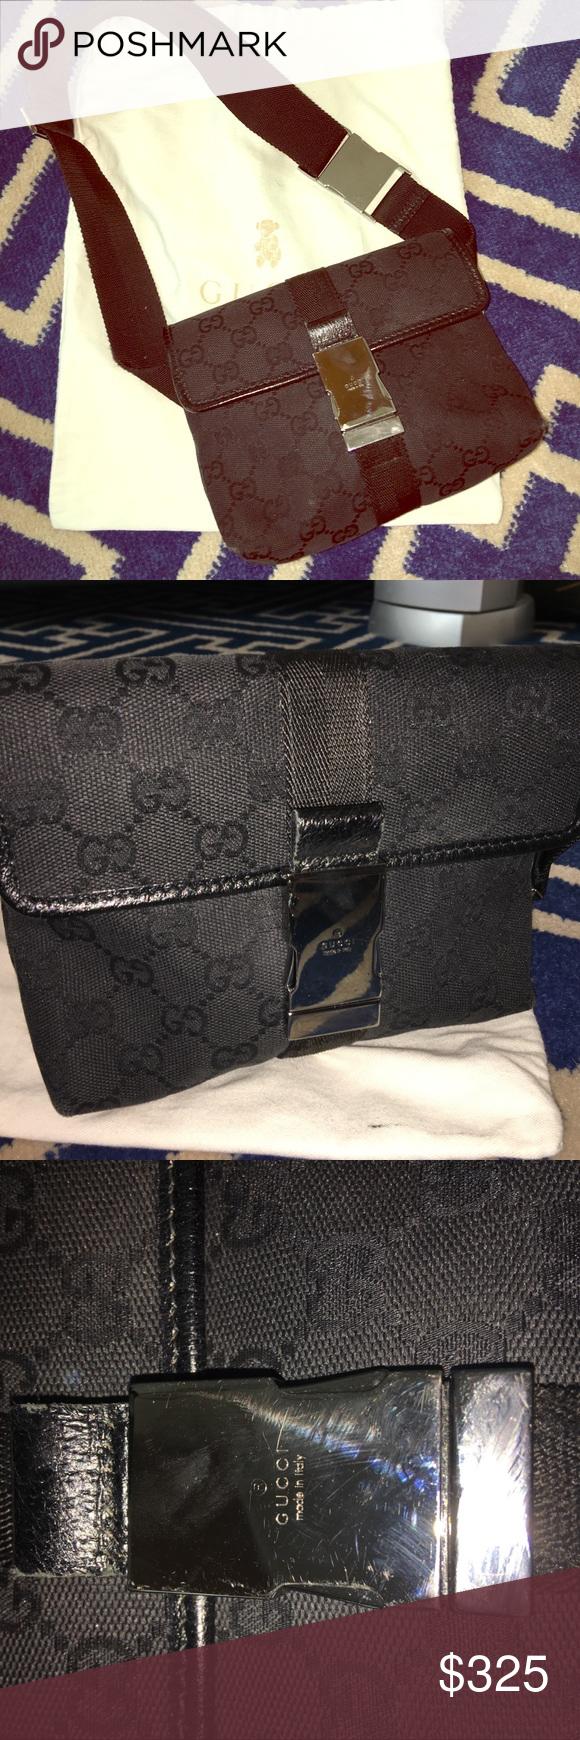 f667971e24cd GUCCI Monogram Small Belt Bag GUCCI Monogram Small Belt Bag Fanny Pack 100%  Authentic This